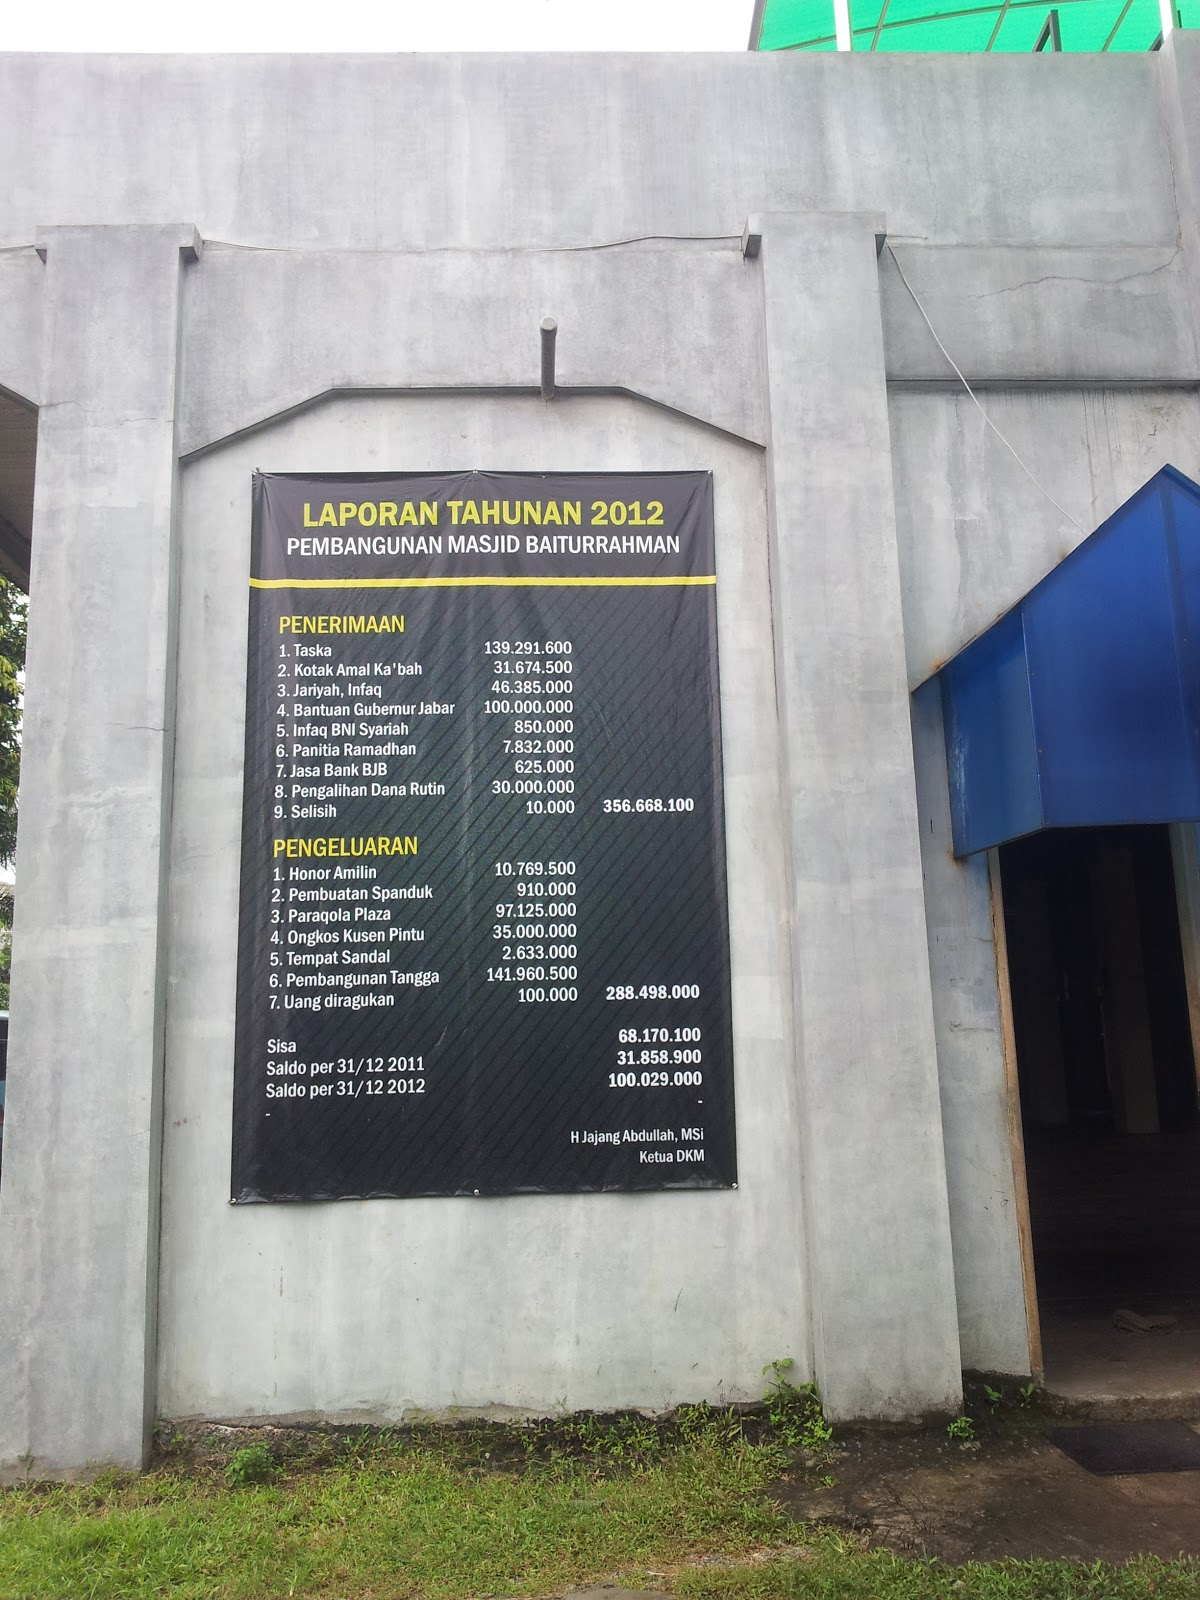 Contoh Laporan Keuangan Masjid